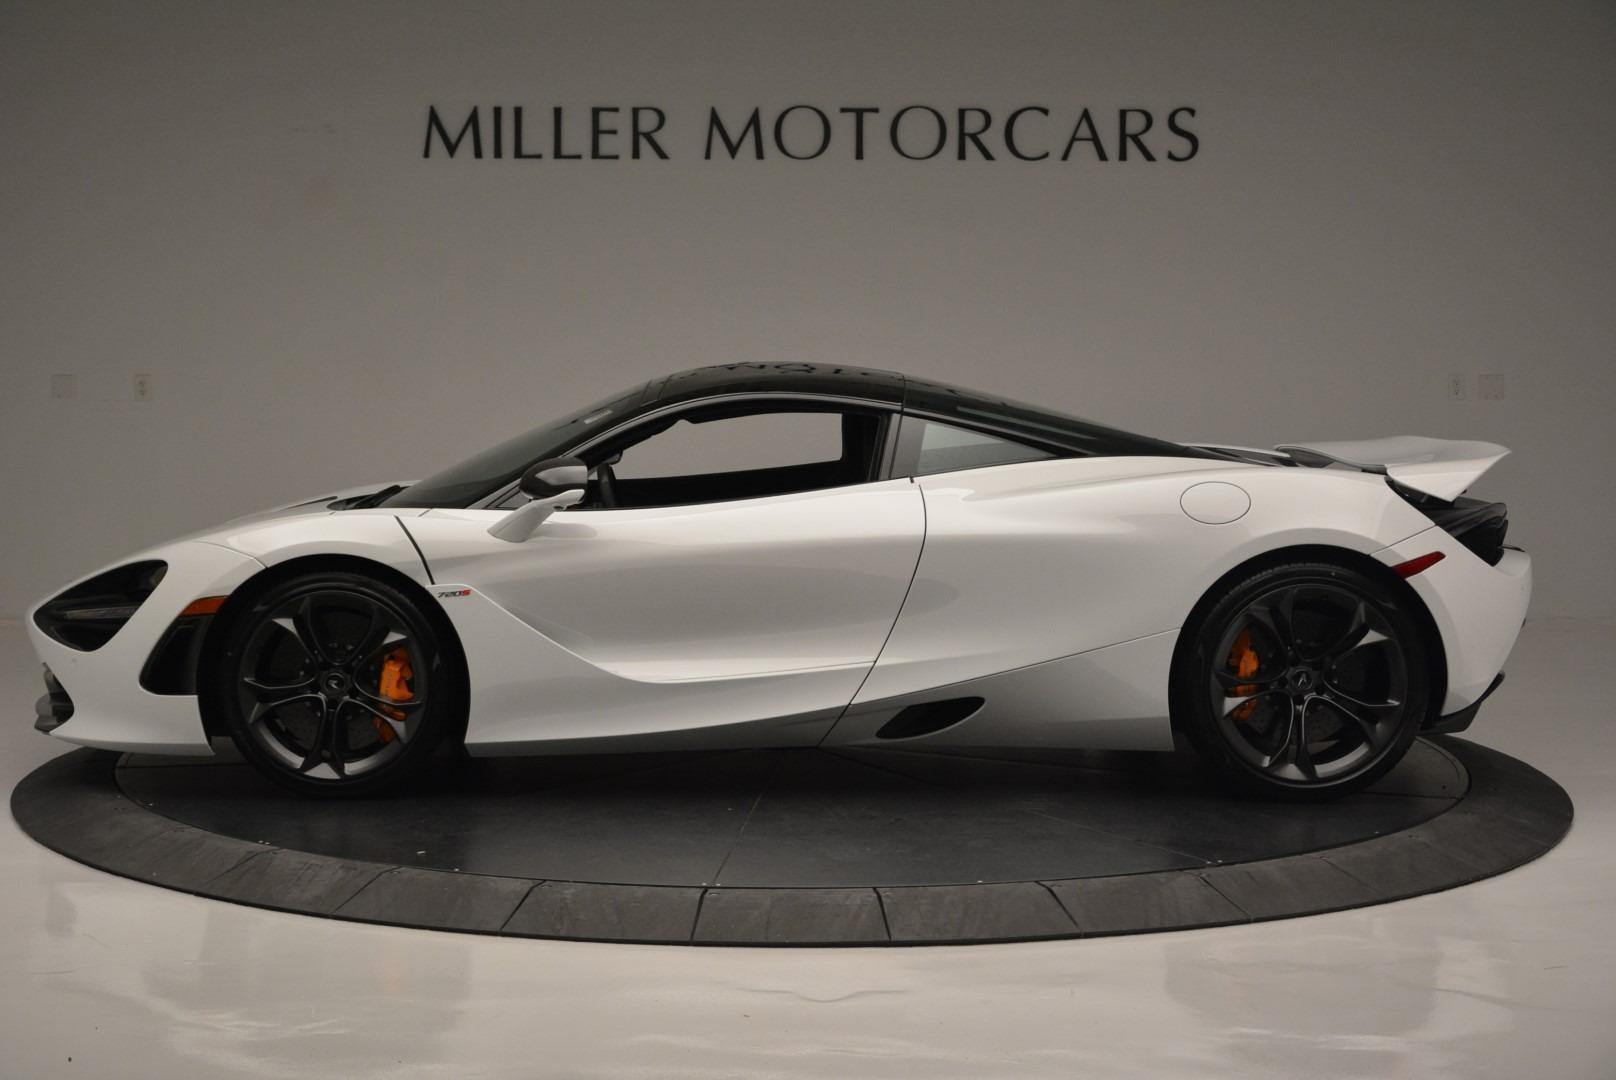 Used 2019 McLaren 720S Coupe For Sale In Westport, CT 2543_p3